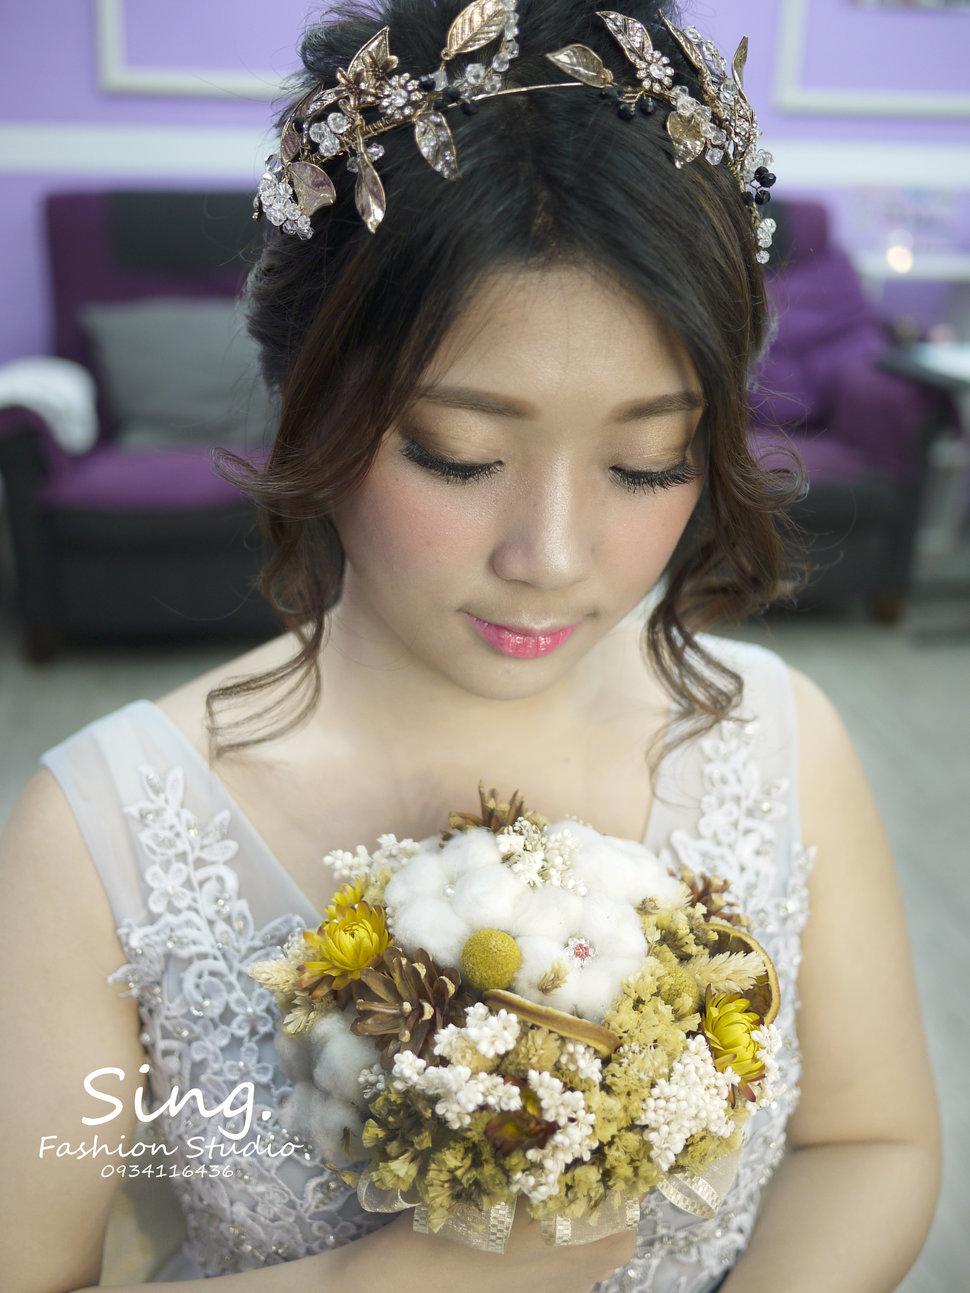 1488665984710 - Sing新娘秘書整體造型《結婚吧》